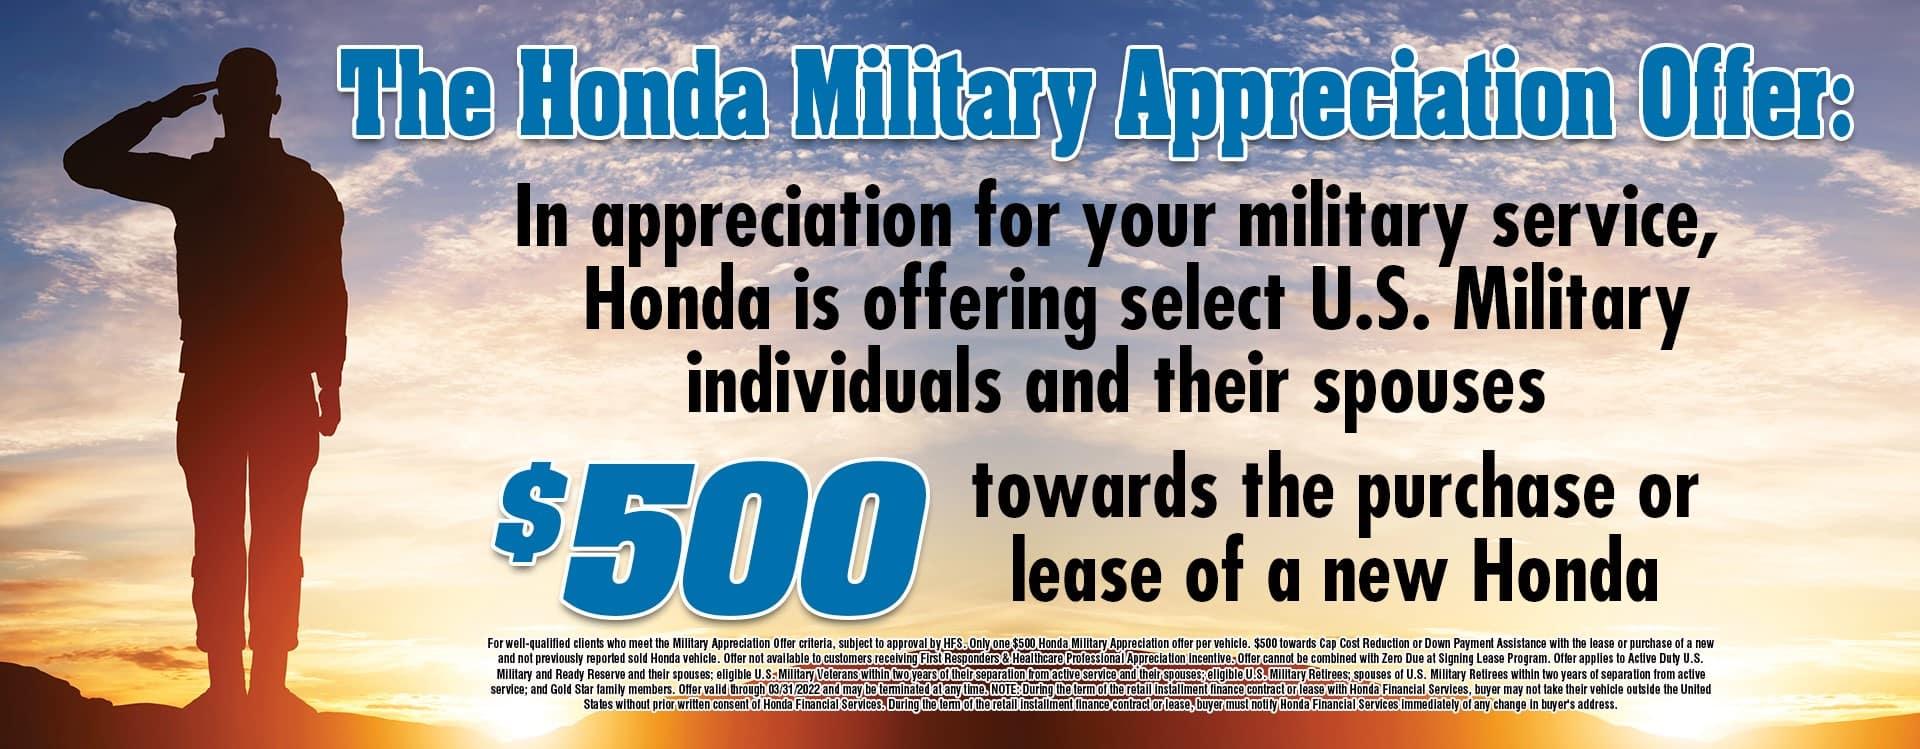 Honda Military Apr 2021